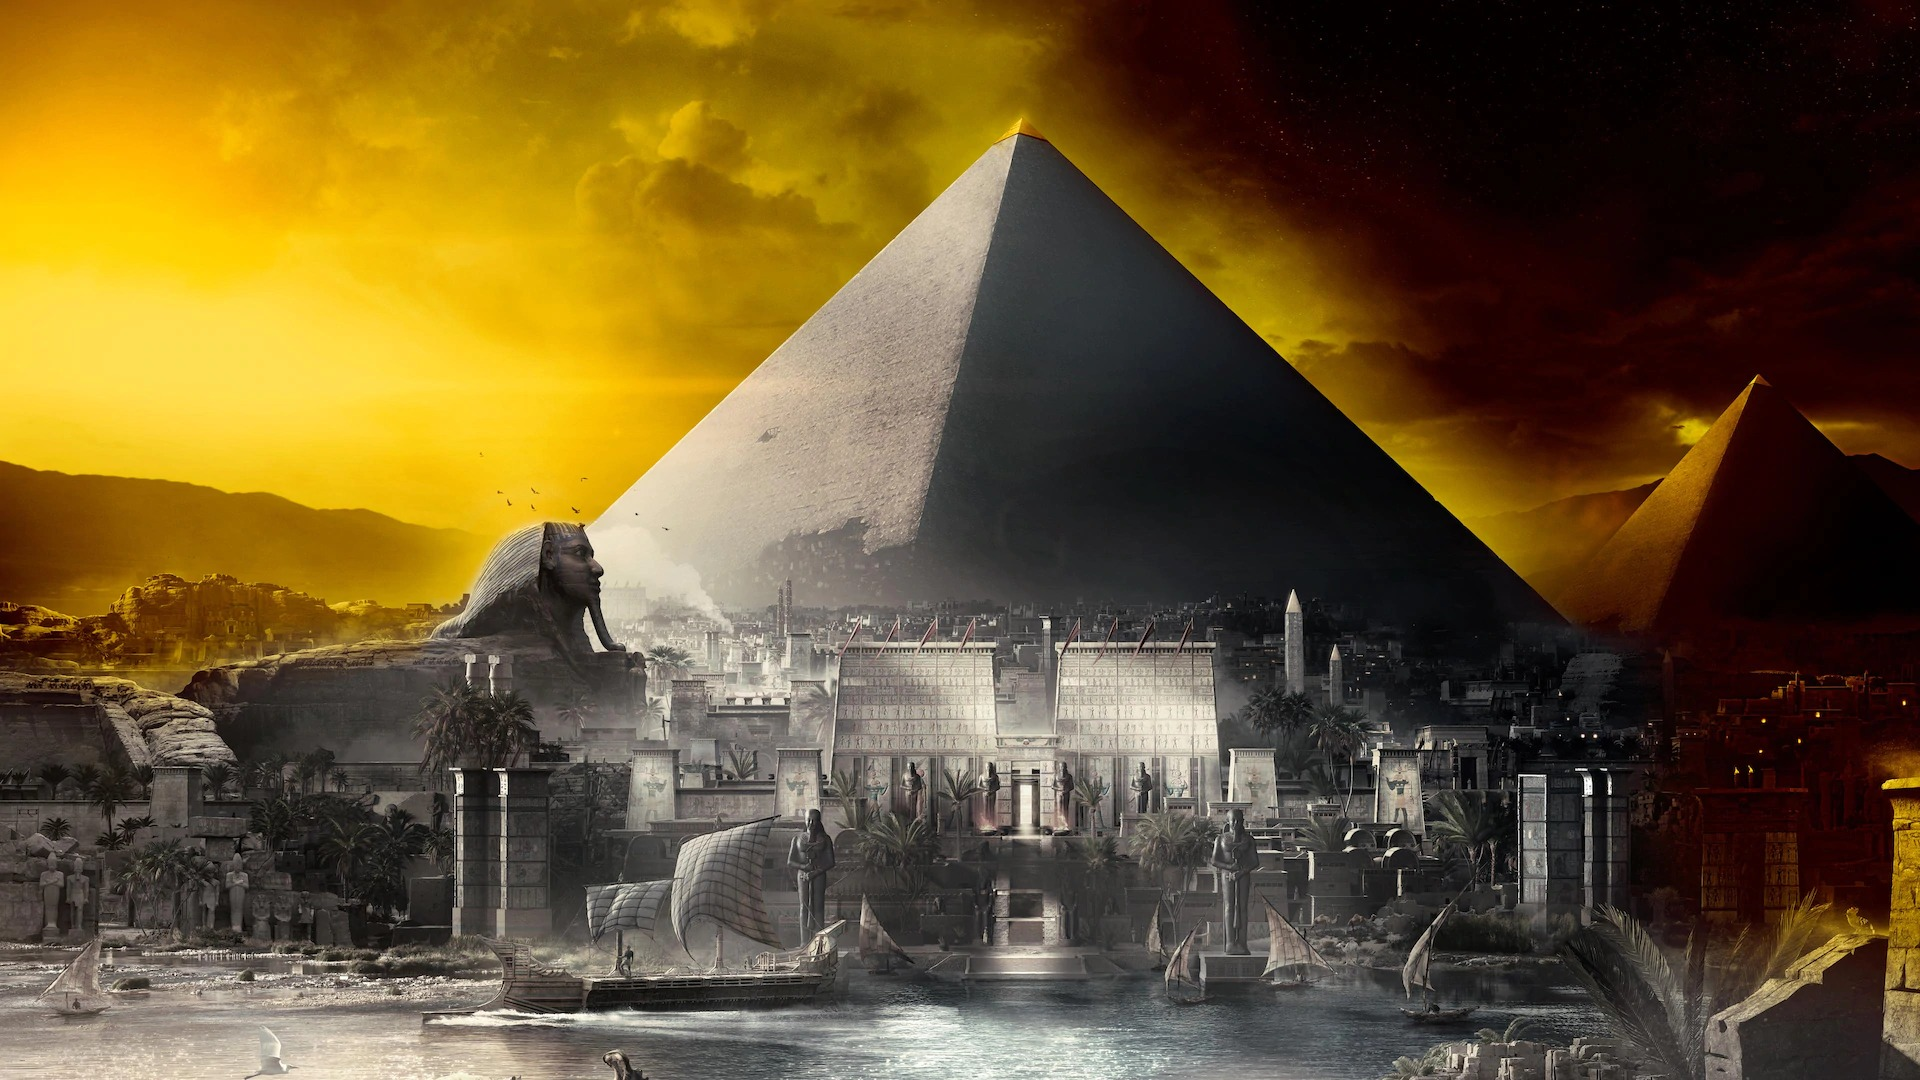 「Assassin's Creed Origins - ゴールドエディション」/通常価格:6,288円(税込)/セール価格:4,087円(税込、35%オフ)/PS Plus加入者:1,886円(税込、70%オフ)